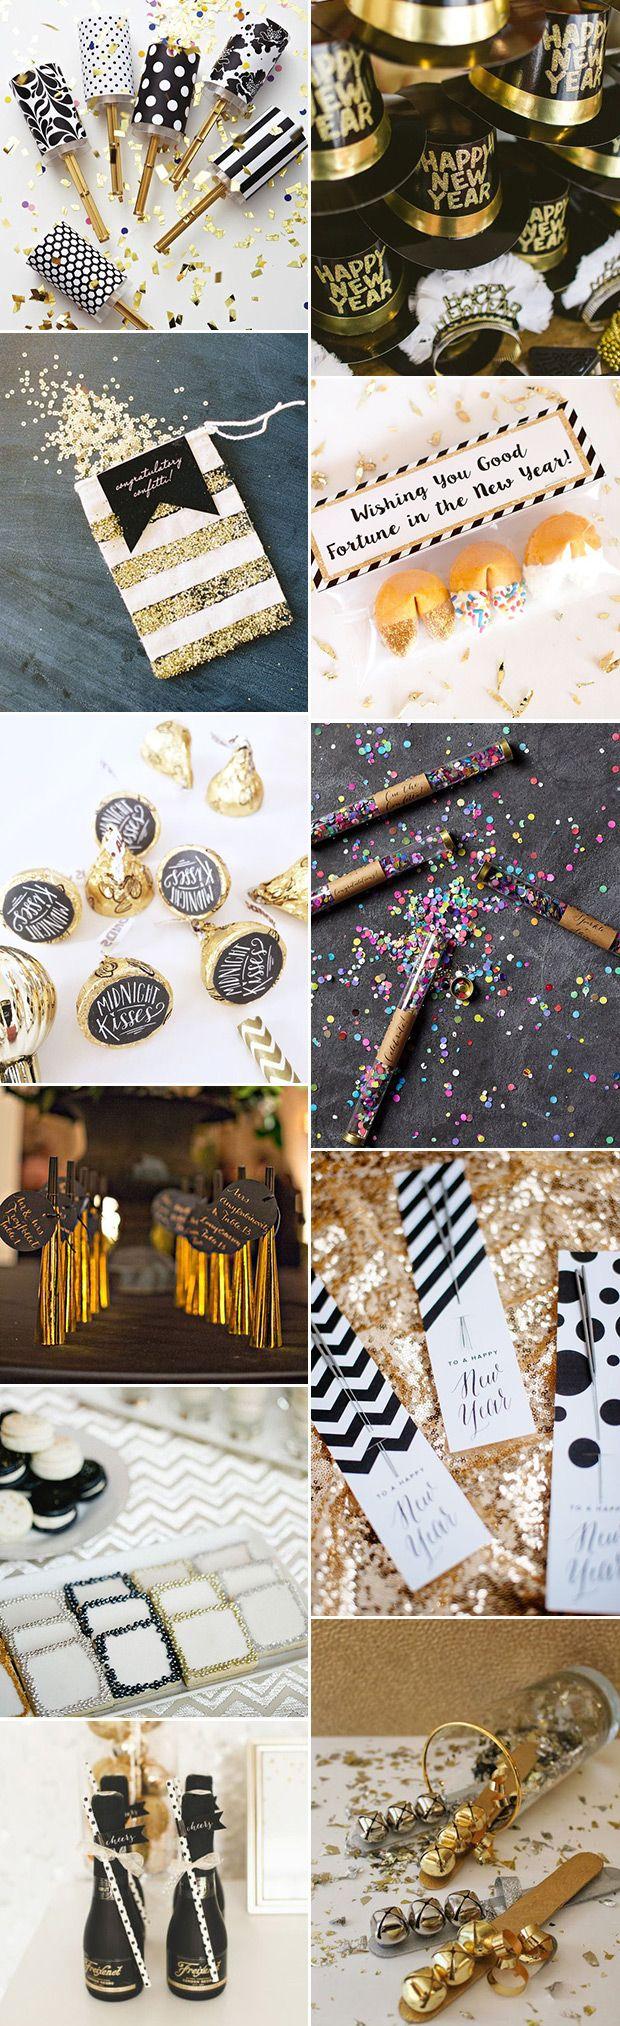 11 Fun Fabulous New Years Eve Wedding Favors Favors Weddings